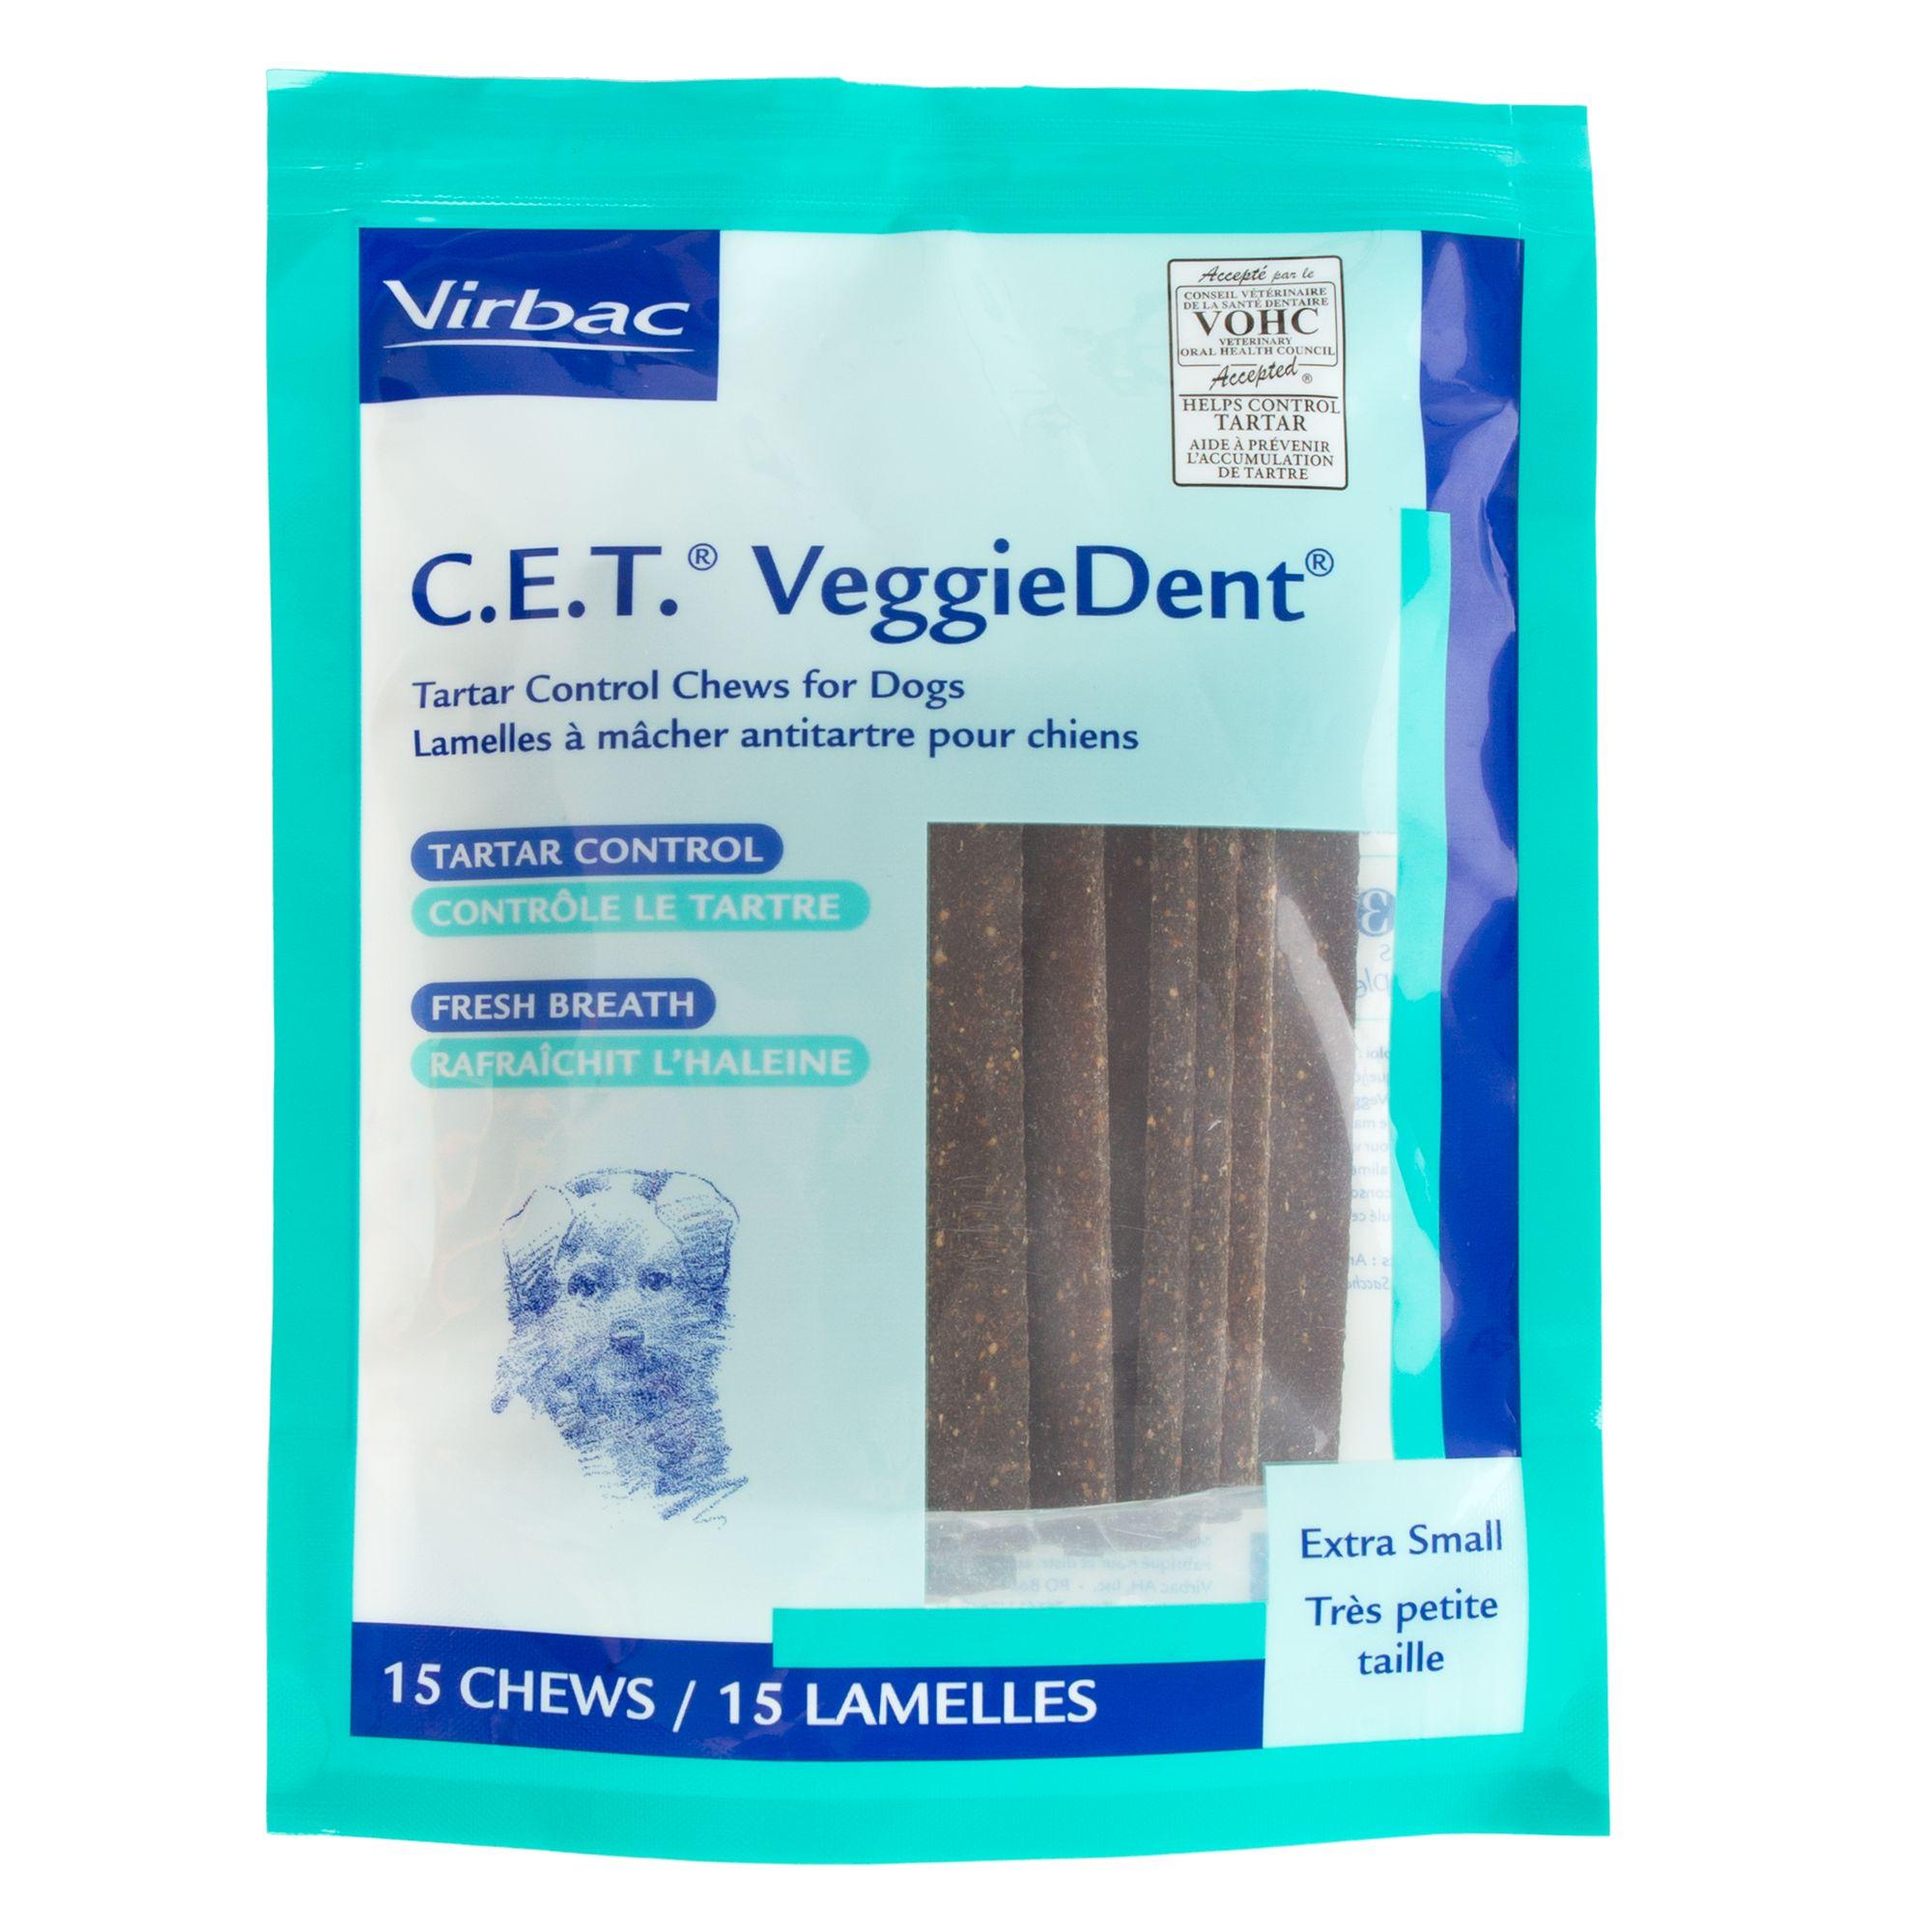 Virbac C.E.T Vegdent Tarter Control Dog Chews size: X Small